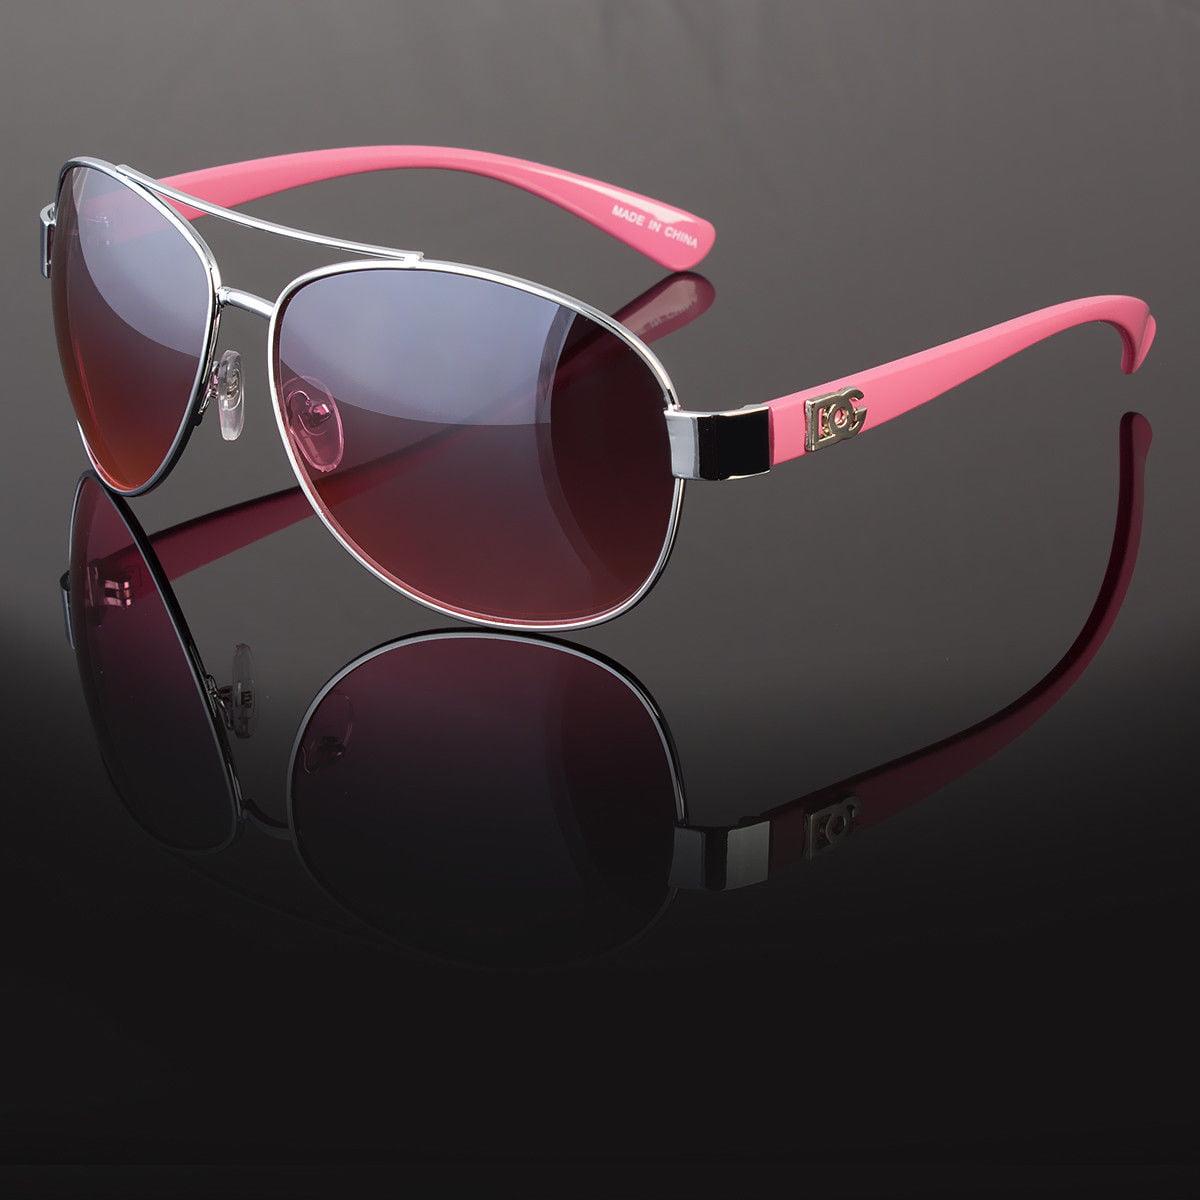 New DG Eyewear Mens Sunglasses Shades Designer Camo Gold Pilot Wrap Turbo Large